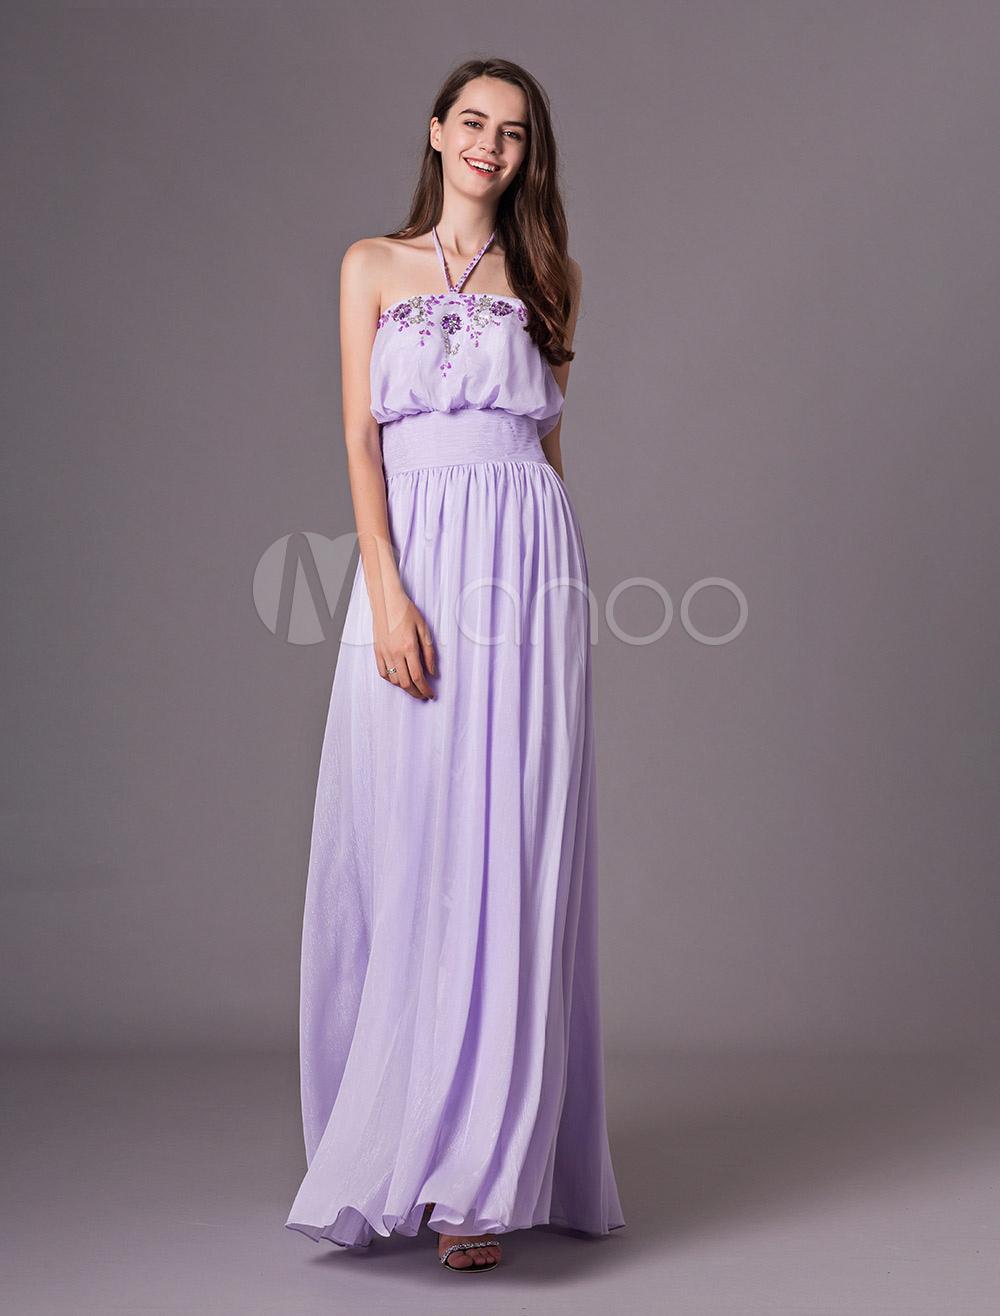 4518c3240b2a3 Lilac Prom Dresses Long Halter Bridesmaid Dress Rhinestones Chiffon  Backless Pleated Party Dress Milanoo-No ...